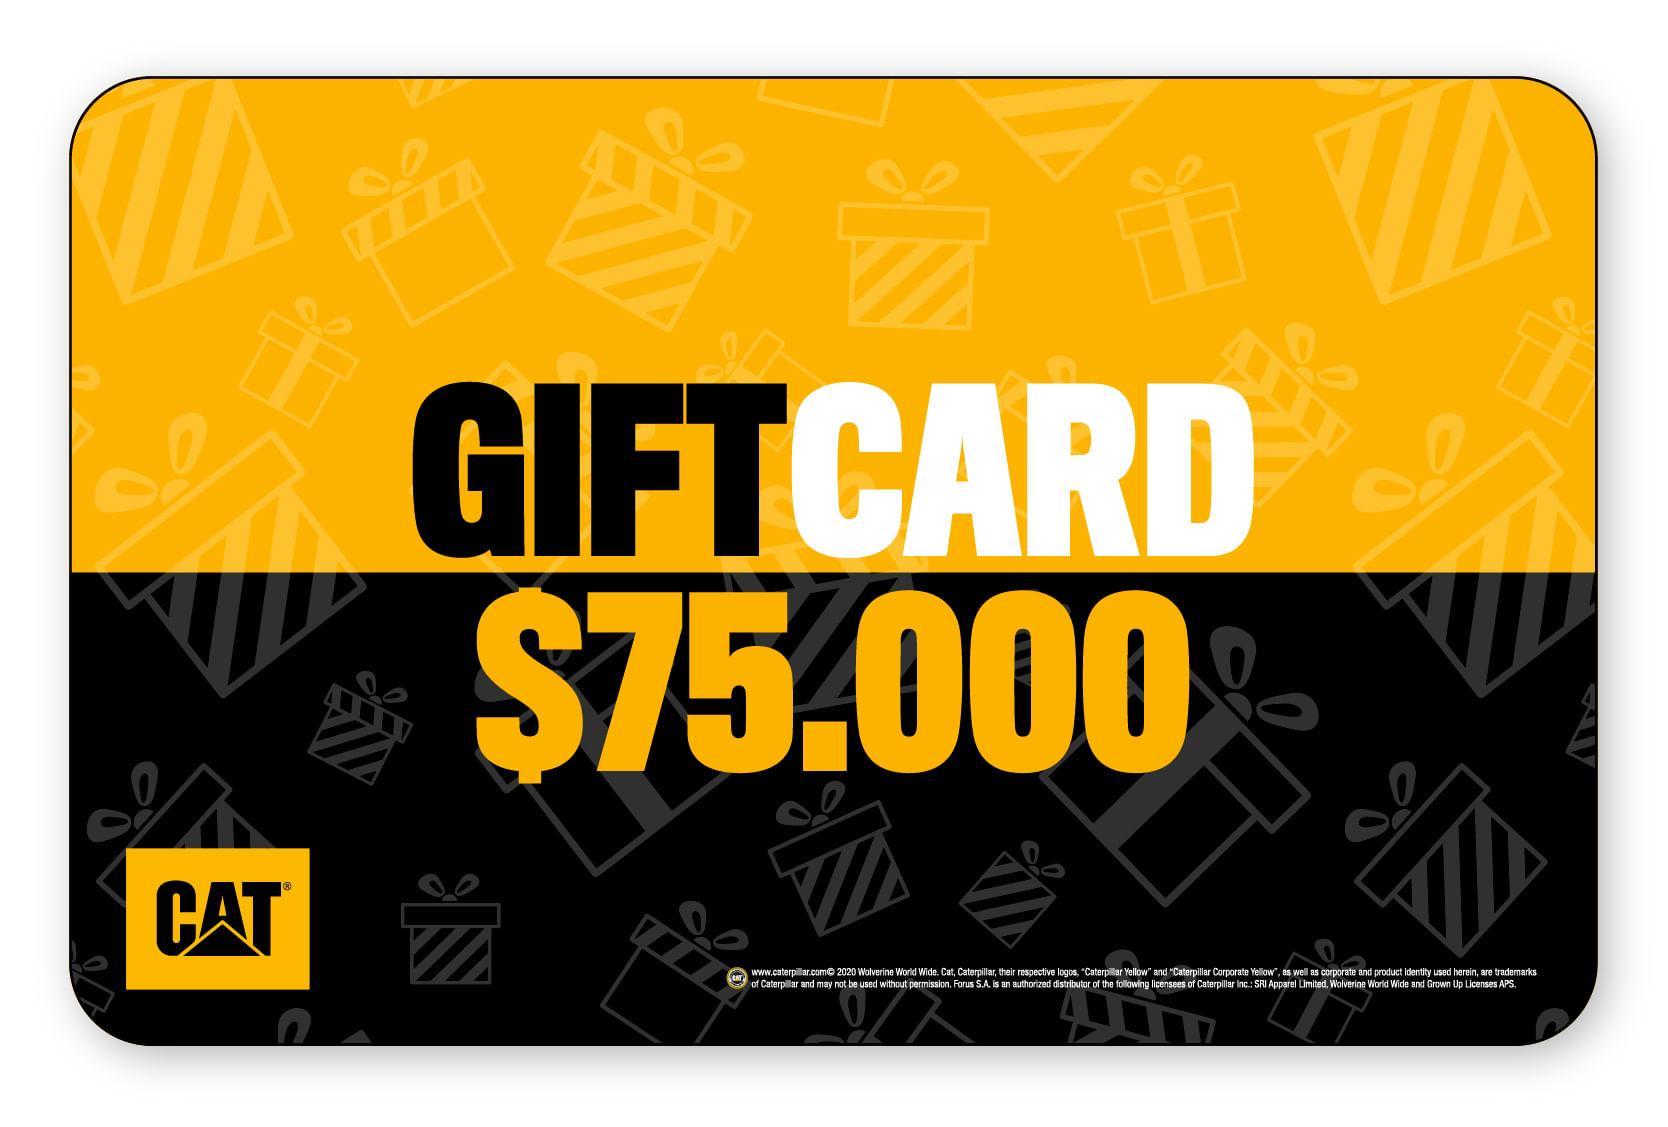 Gift Card $75.000